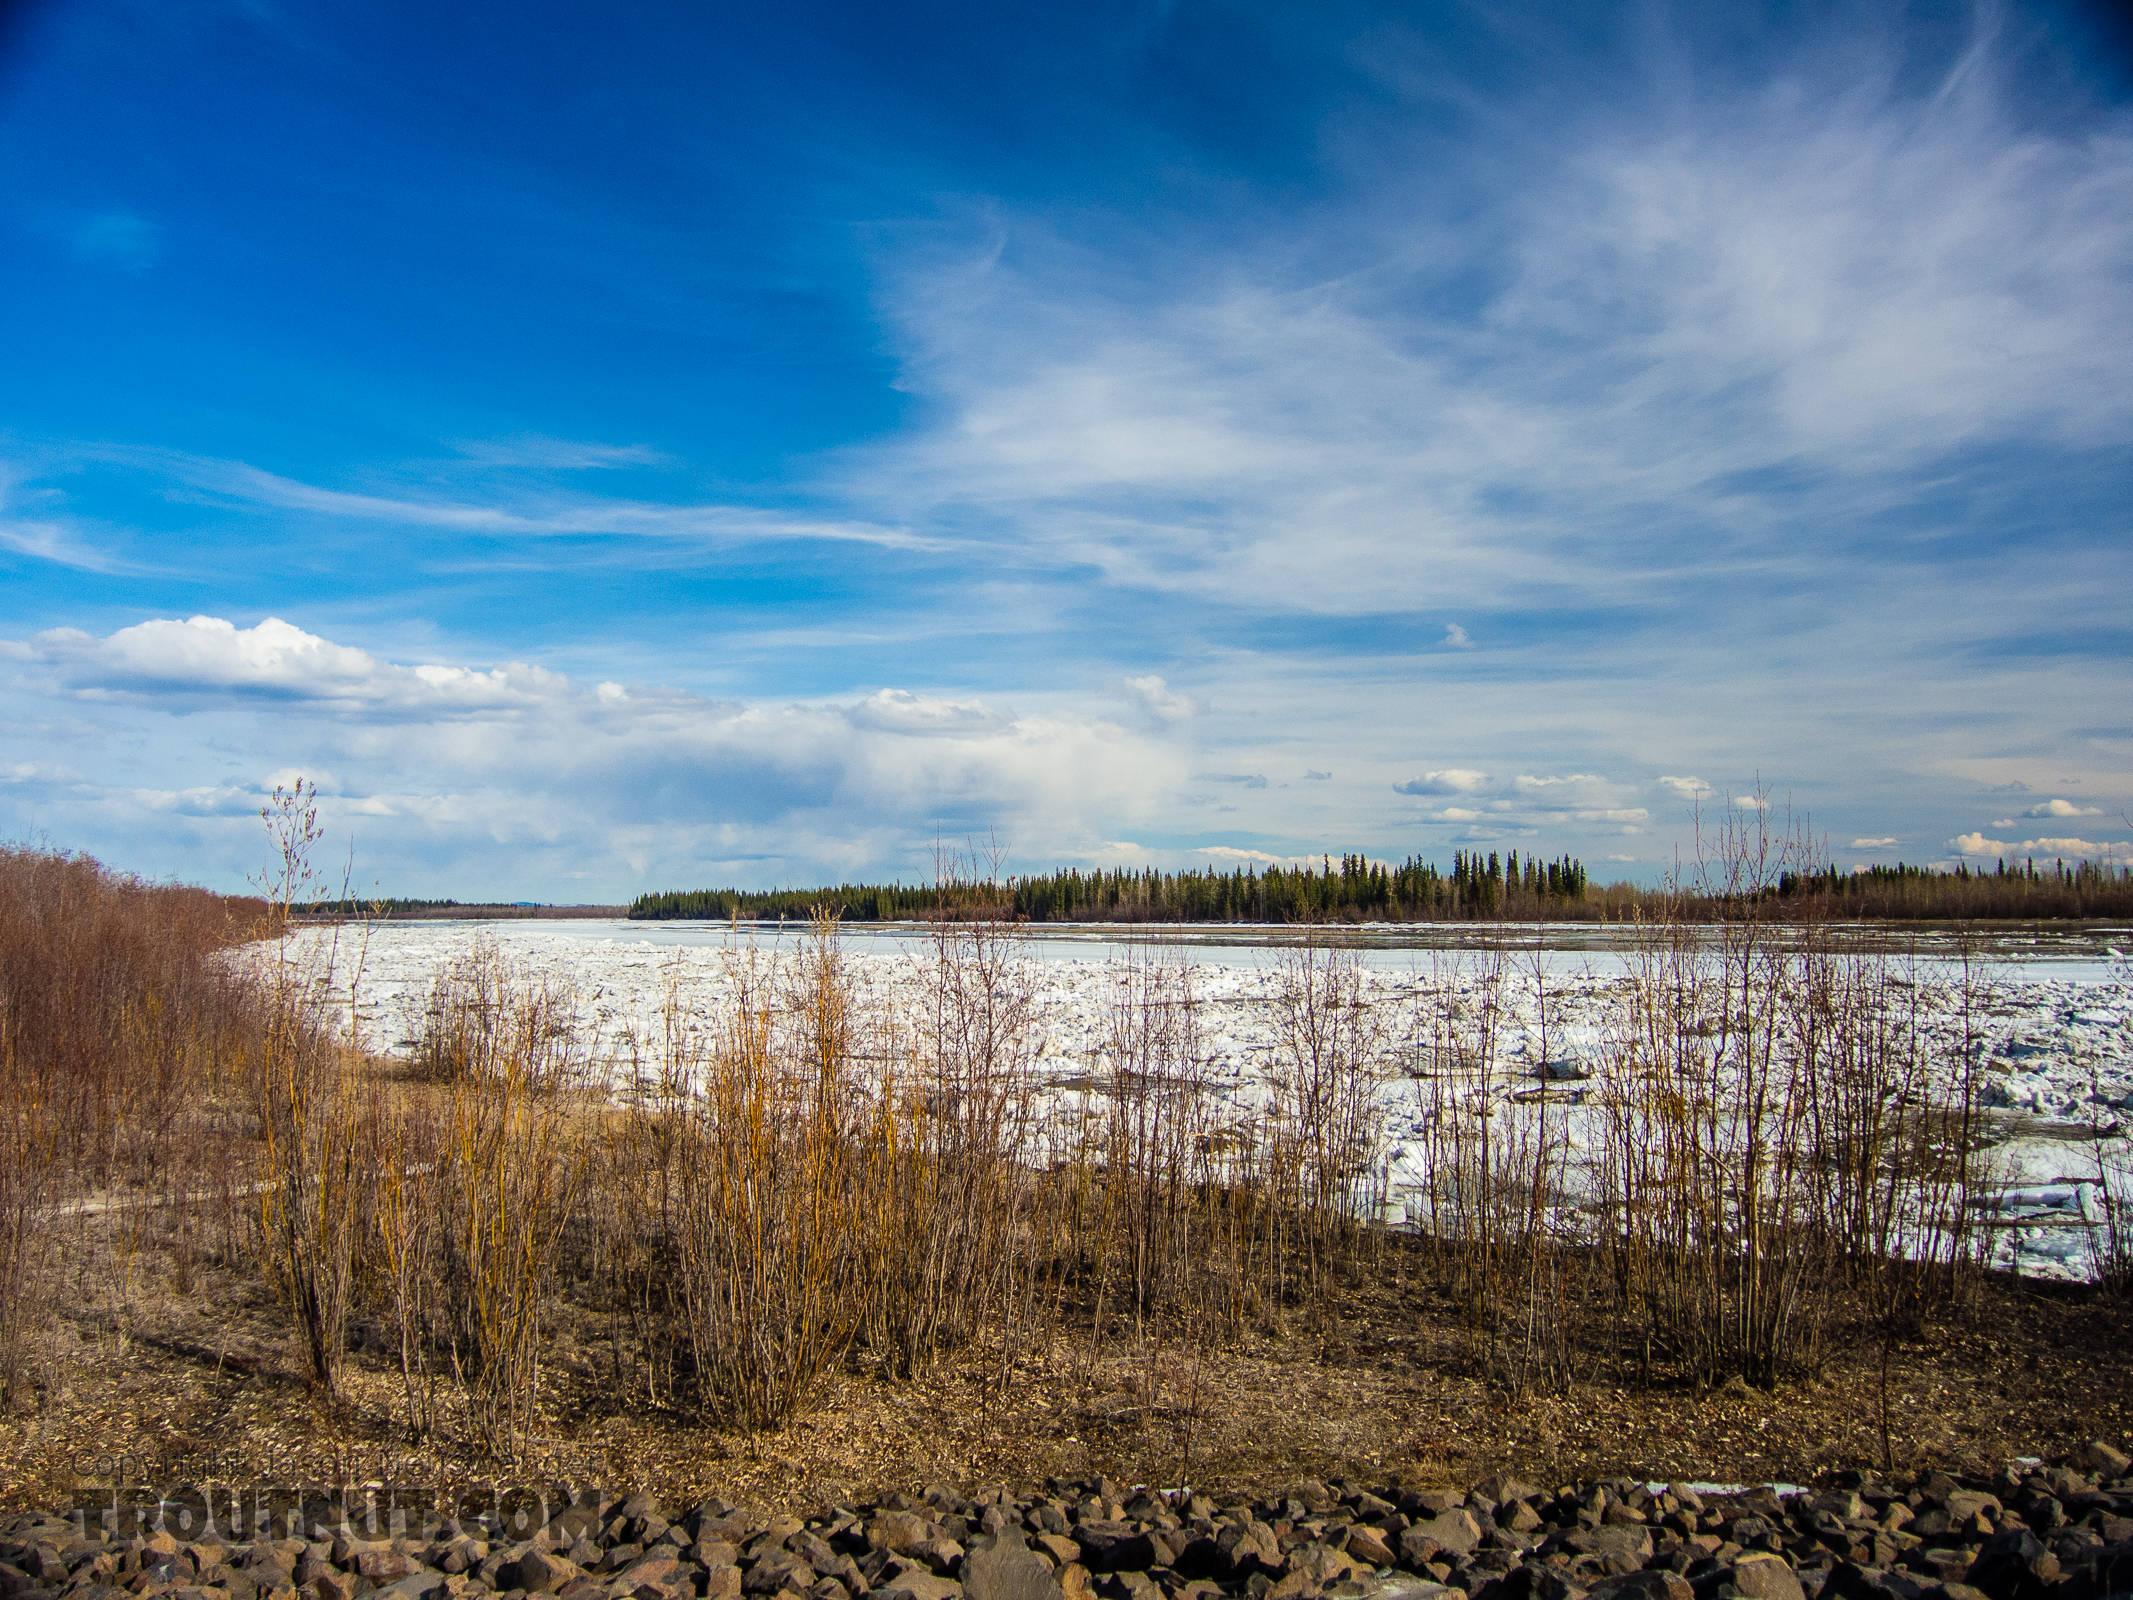 Ice piled up on the Tanana From the Tanana River in Alaska.